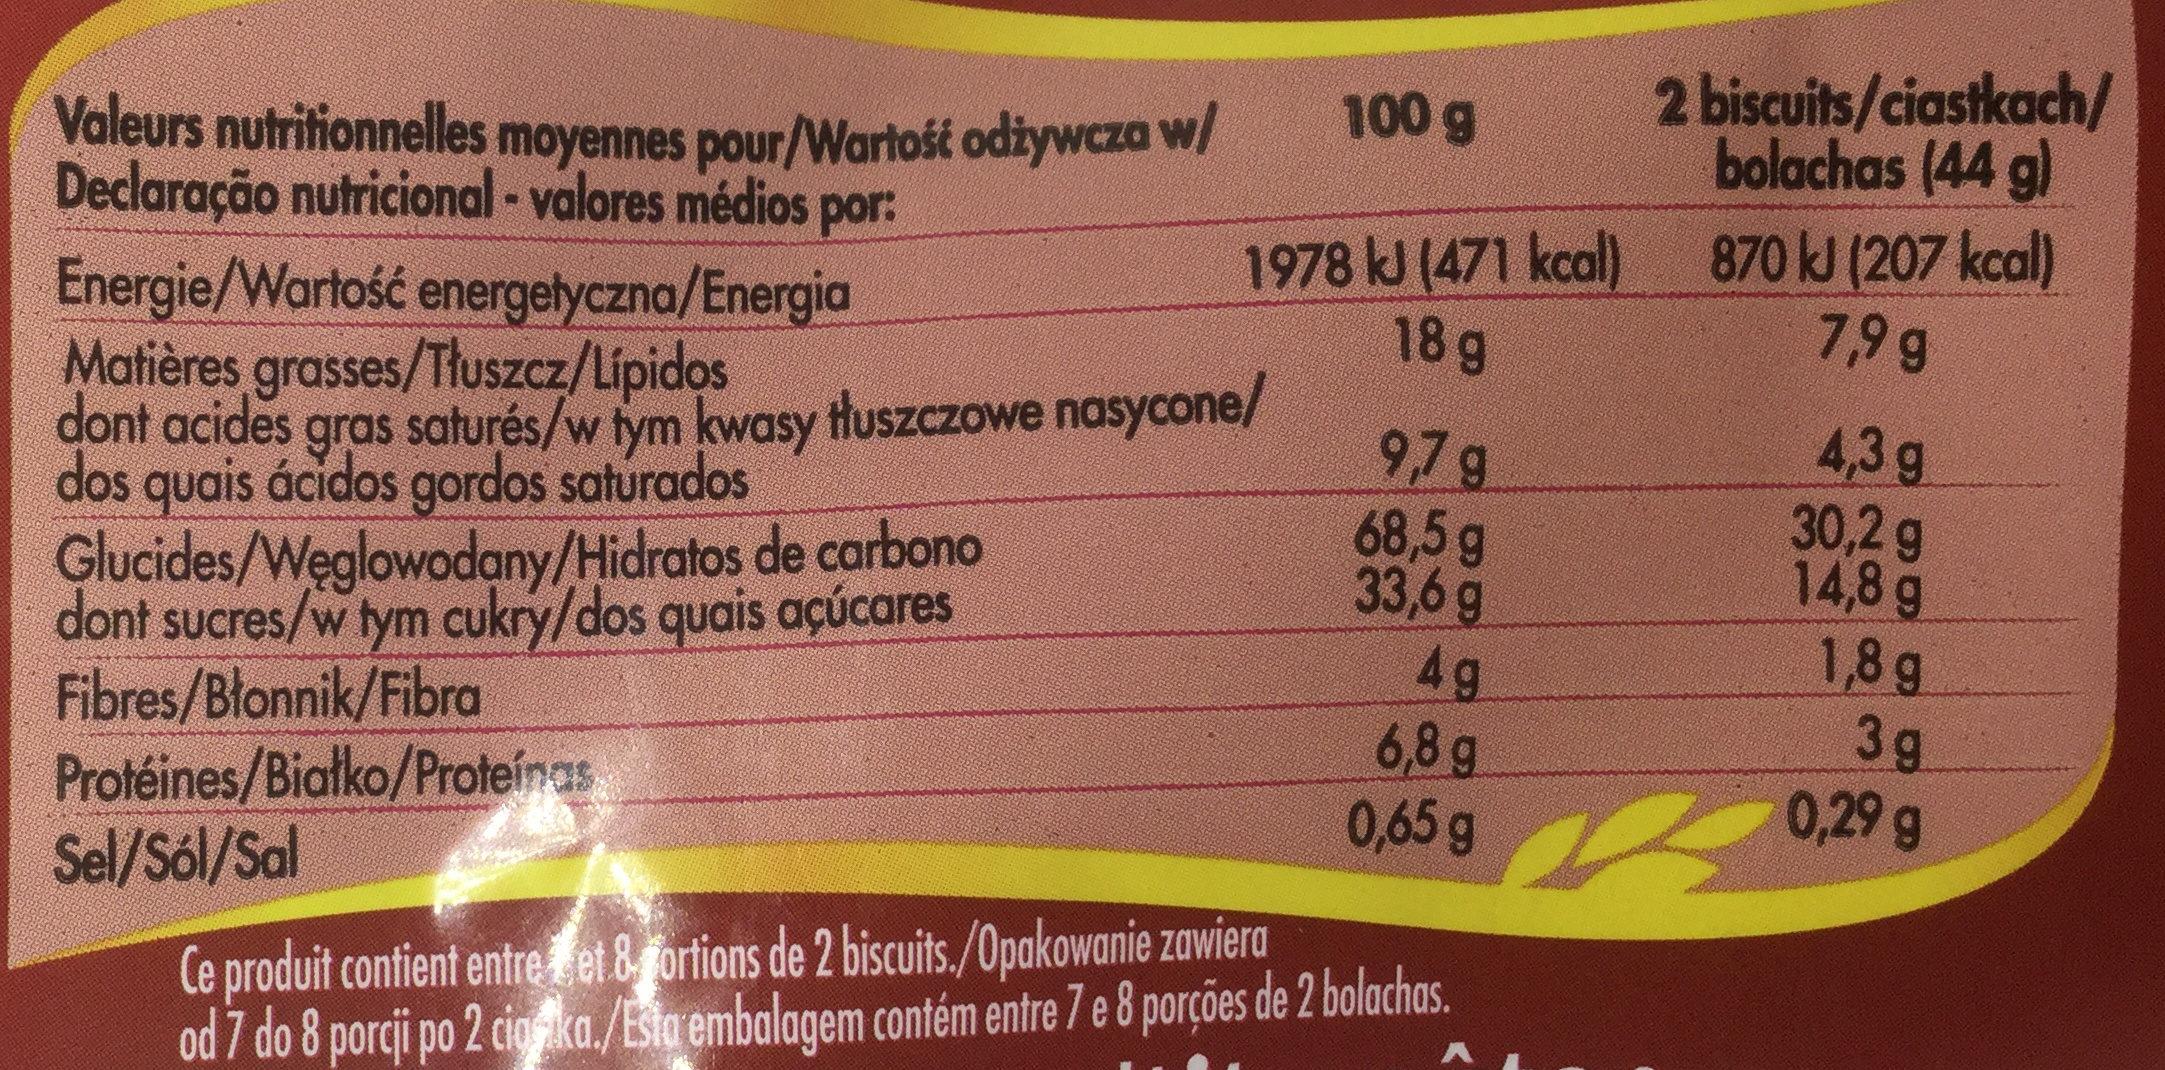 Goûter Crok parfum tout chocolat - Nutrition facts